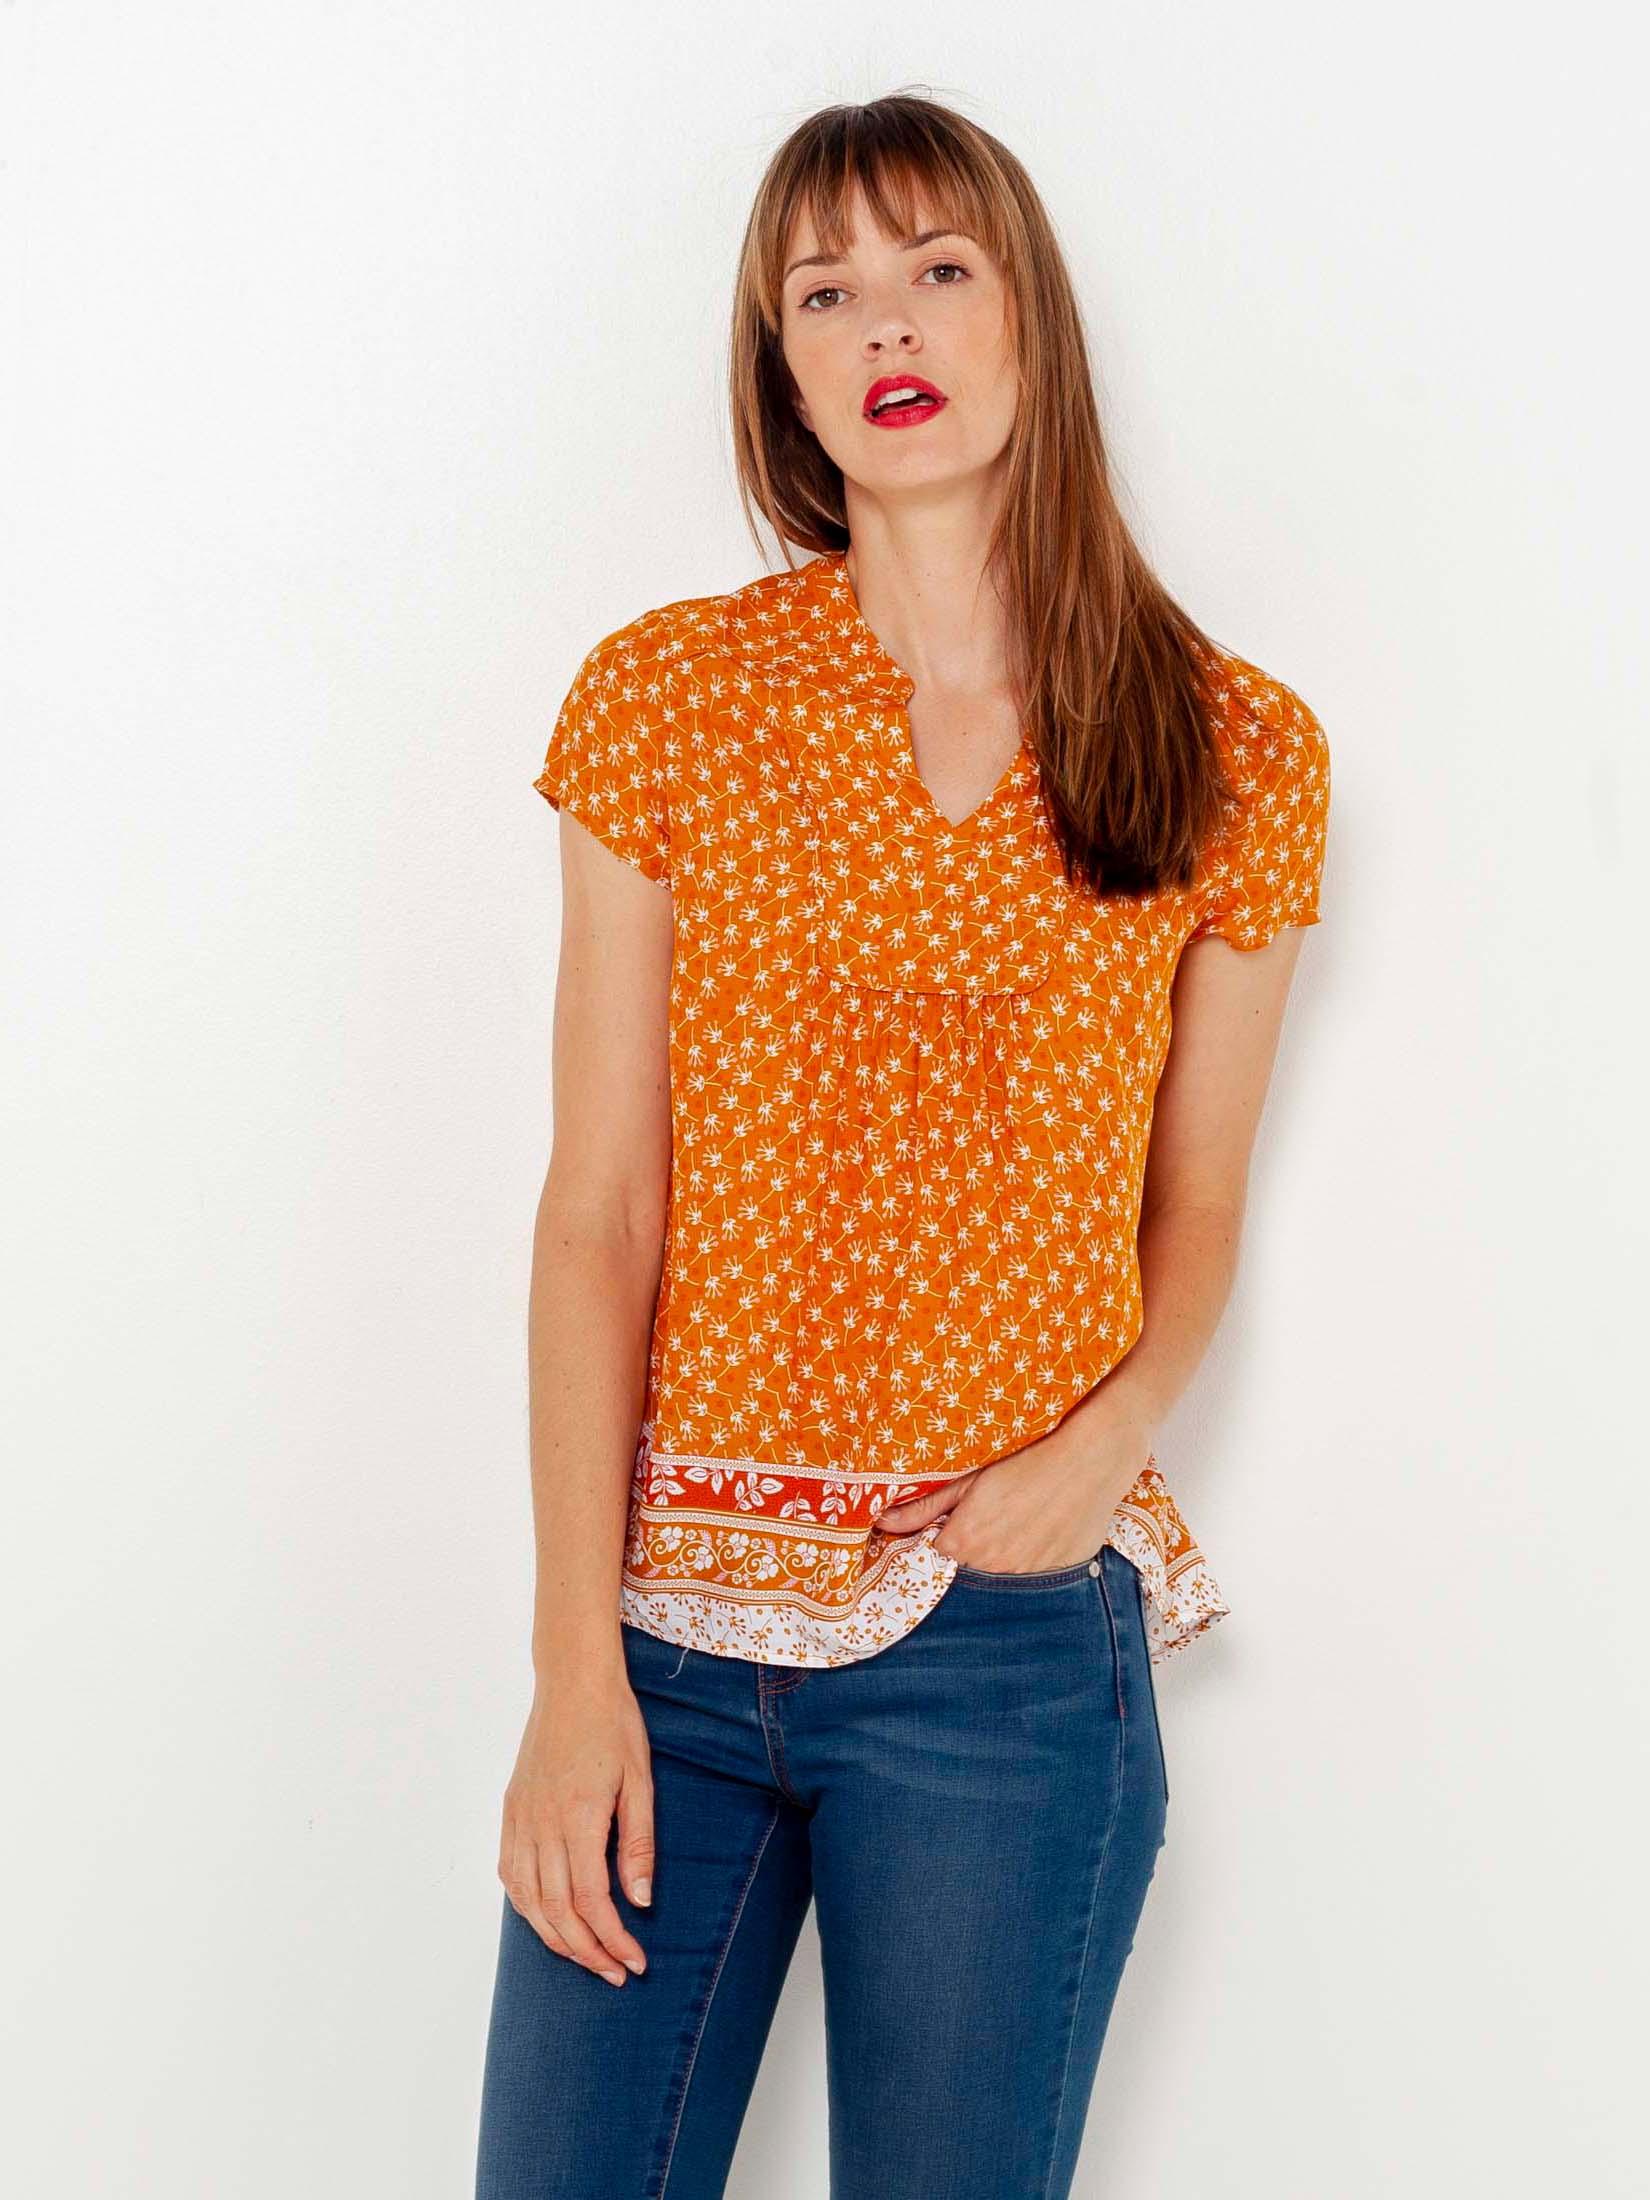 CAMAIEU orange blouse with pattern